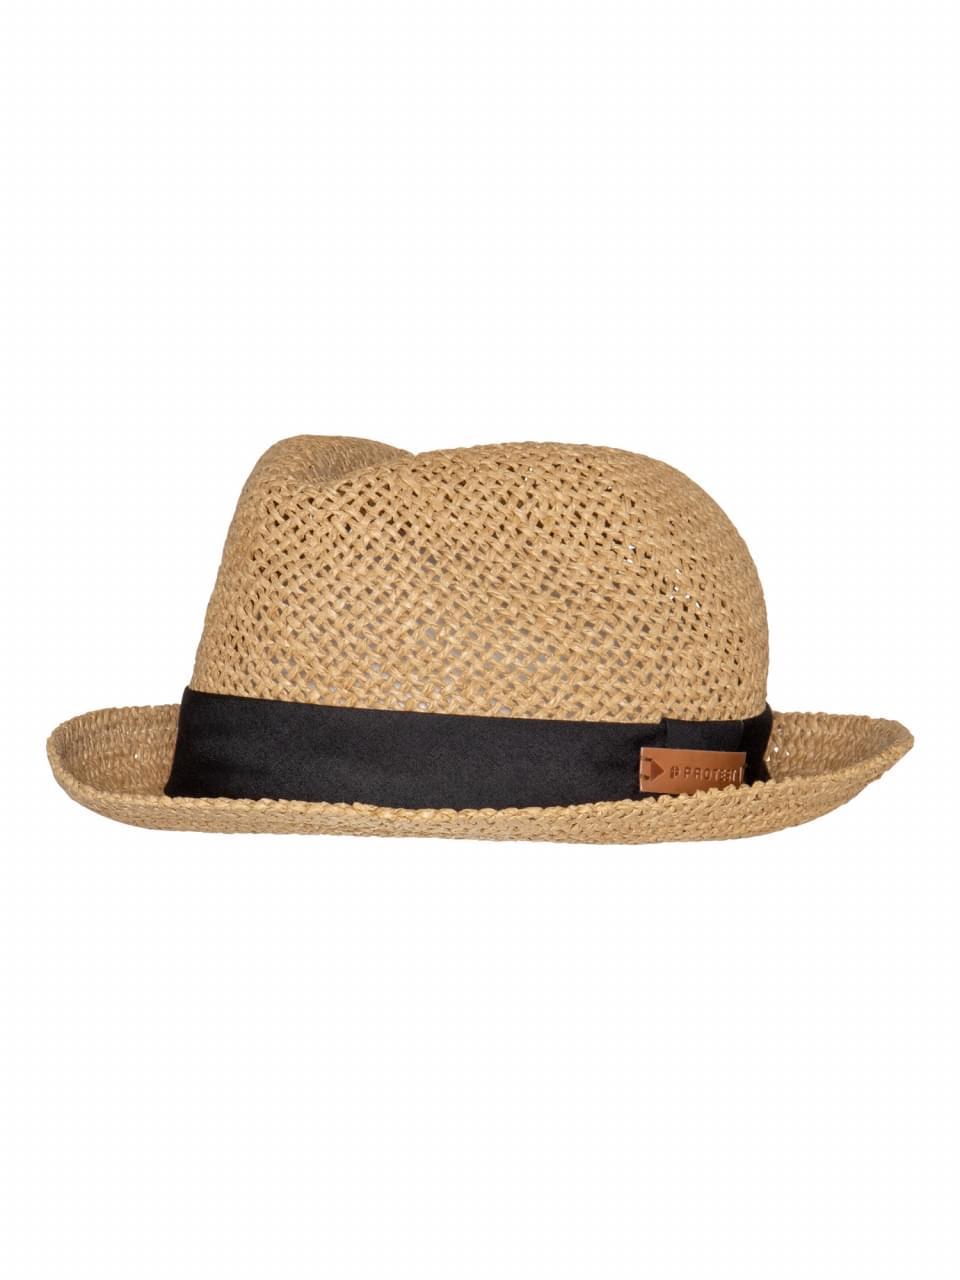 Protest Washington 20 Hat